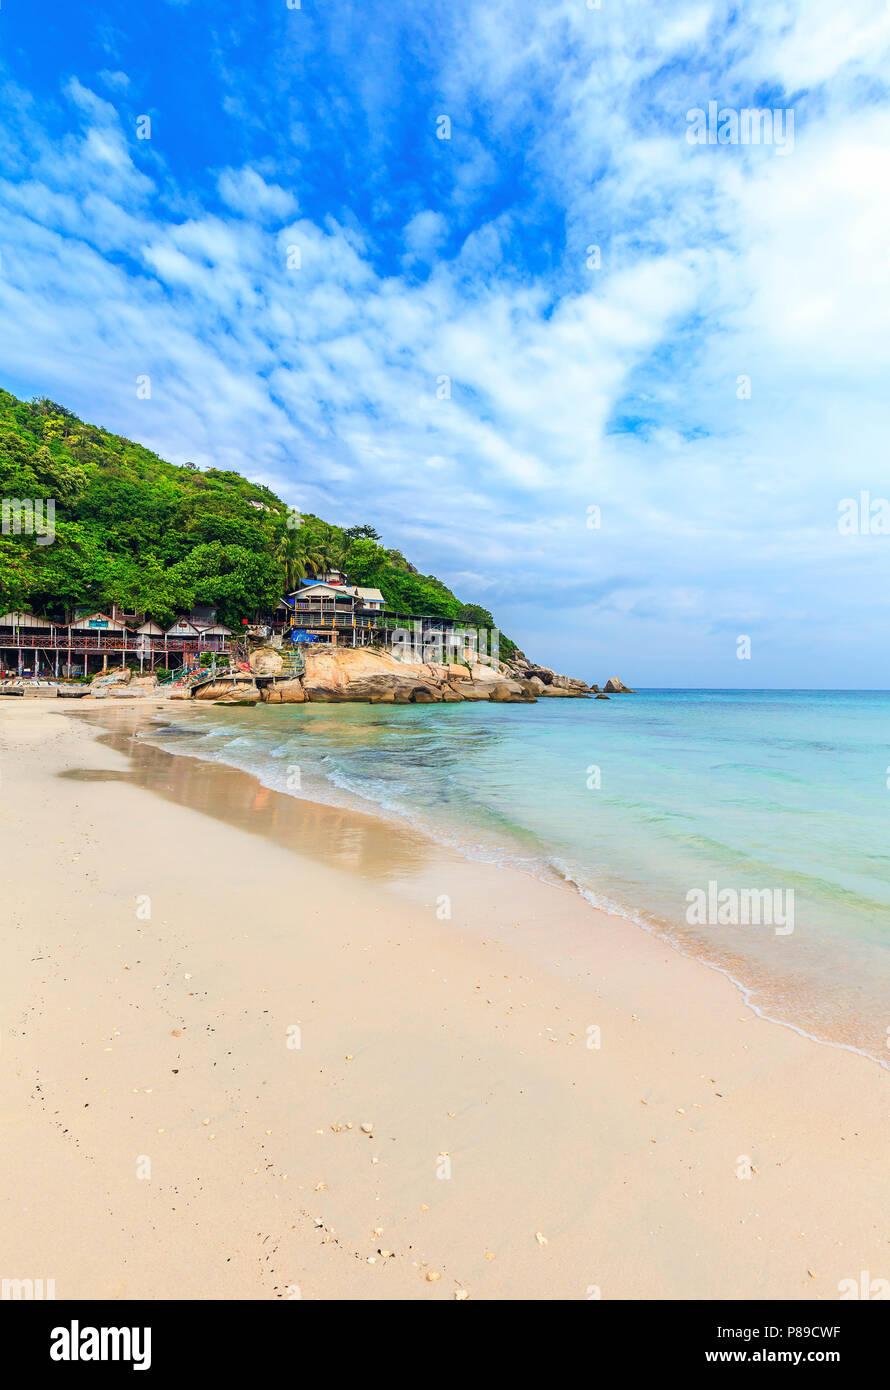 Haad Rin Beach. Veranstaltungsort des berühmten Full Moon Party. Koh Phangan. Thailand. Stockbild